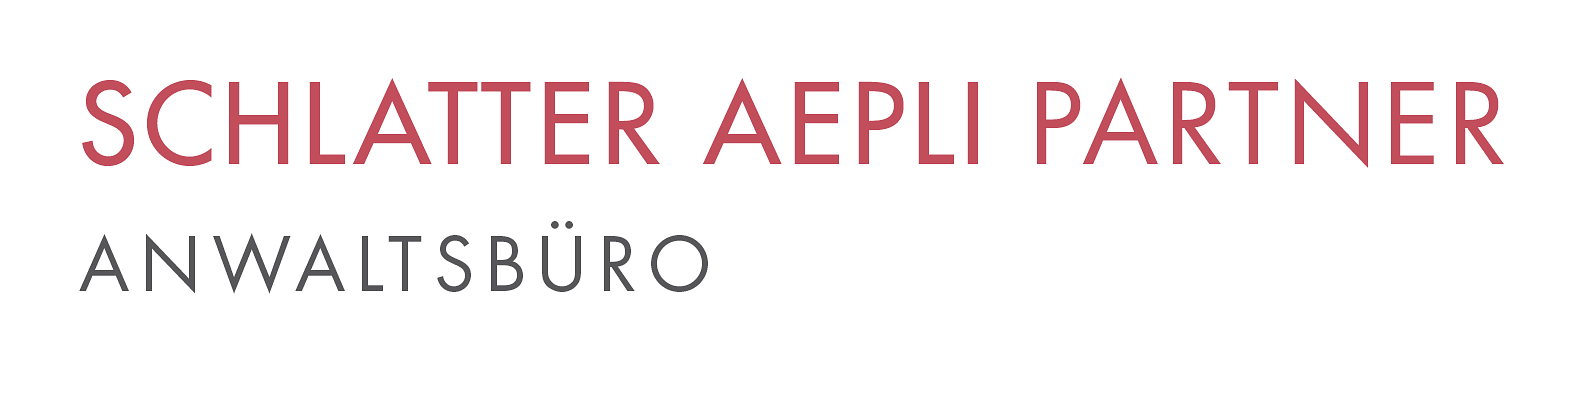 Anwaltsbüro Schlatter Aepli Partner